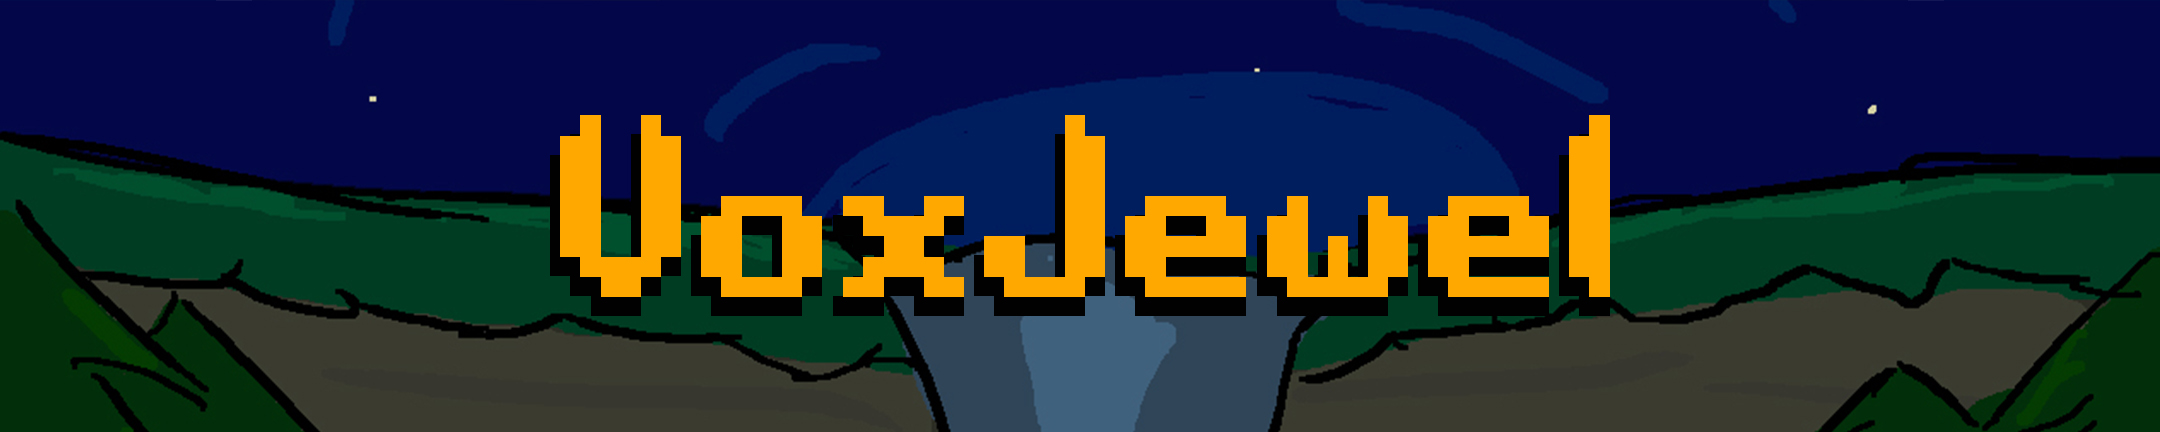 VoxJewel